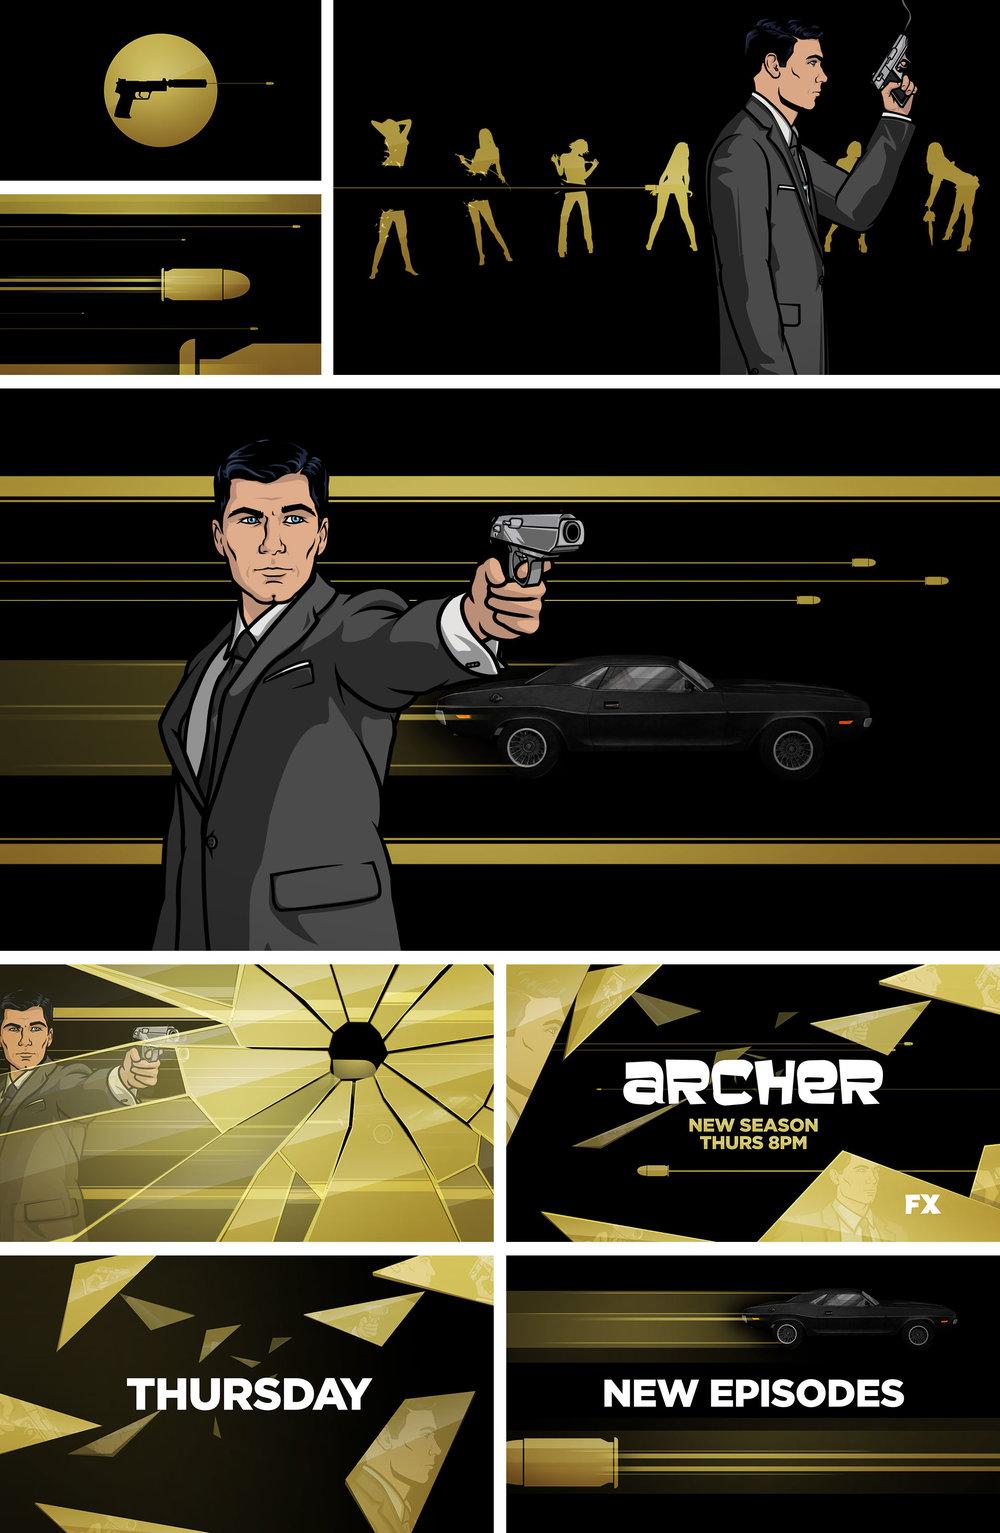 archer_frames.jpg